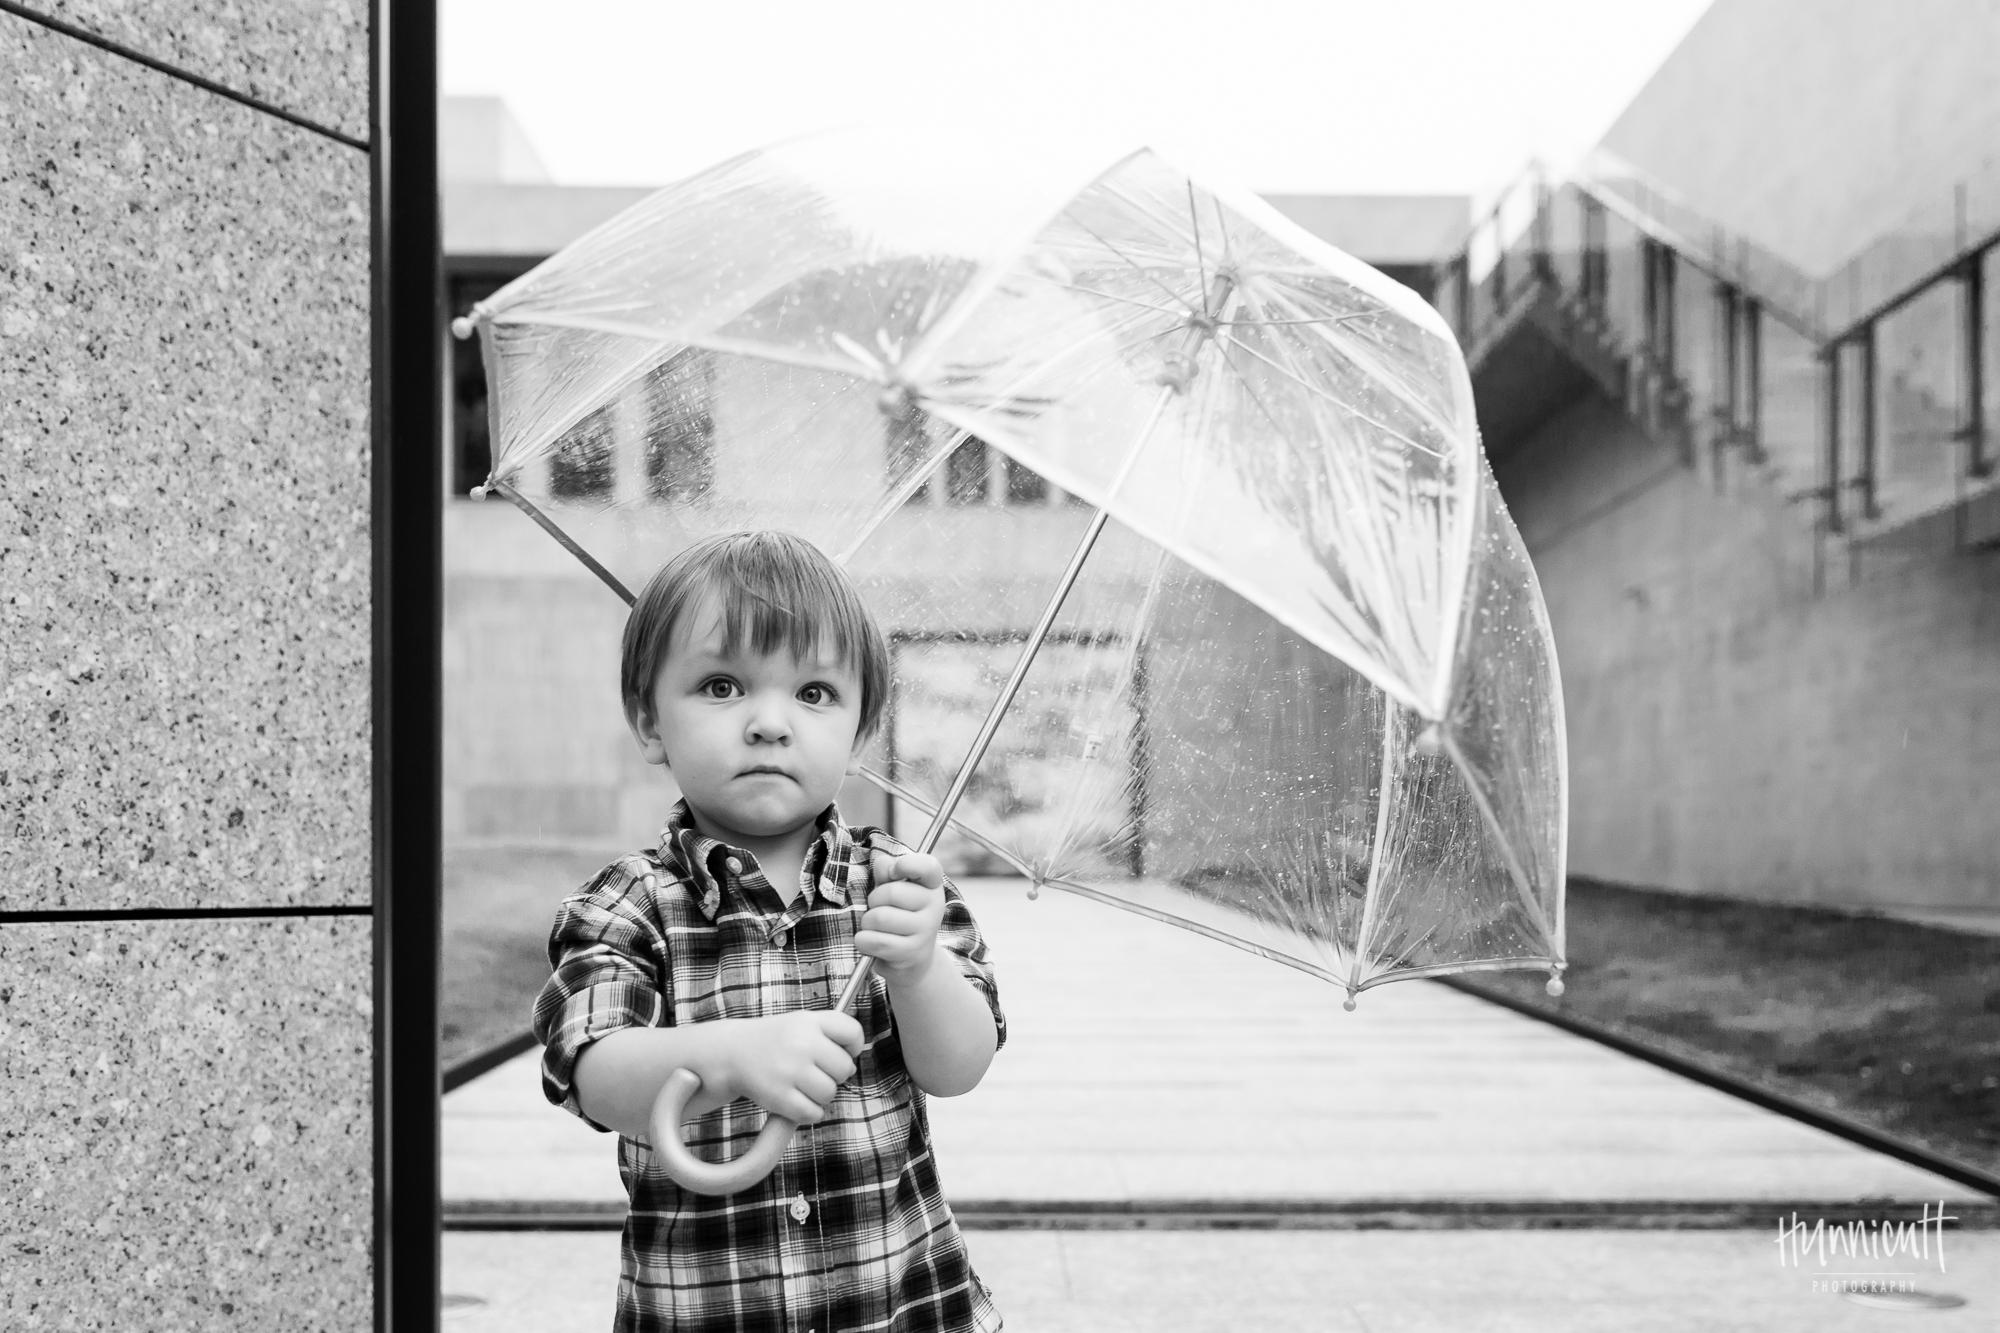 Outdoor-Modern-Urban-Family-Hunnicutt-Photography-Rebecca-Hunnicutt-Farren-Taichung-Taiwan-Exploring-Neighborhood-18